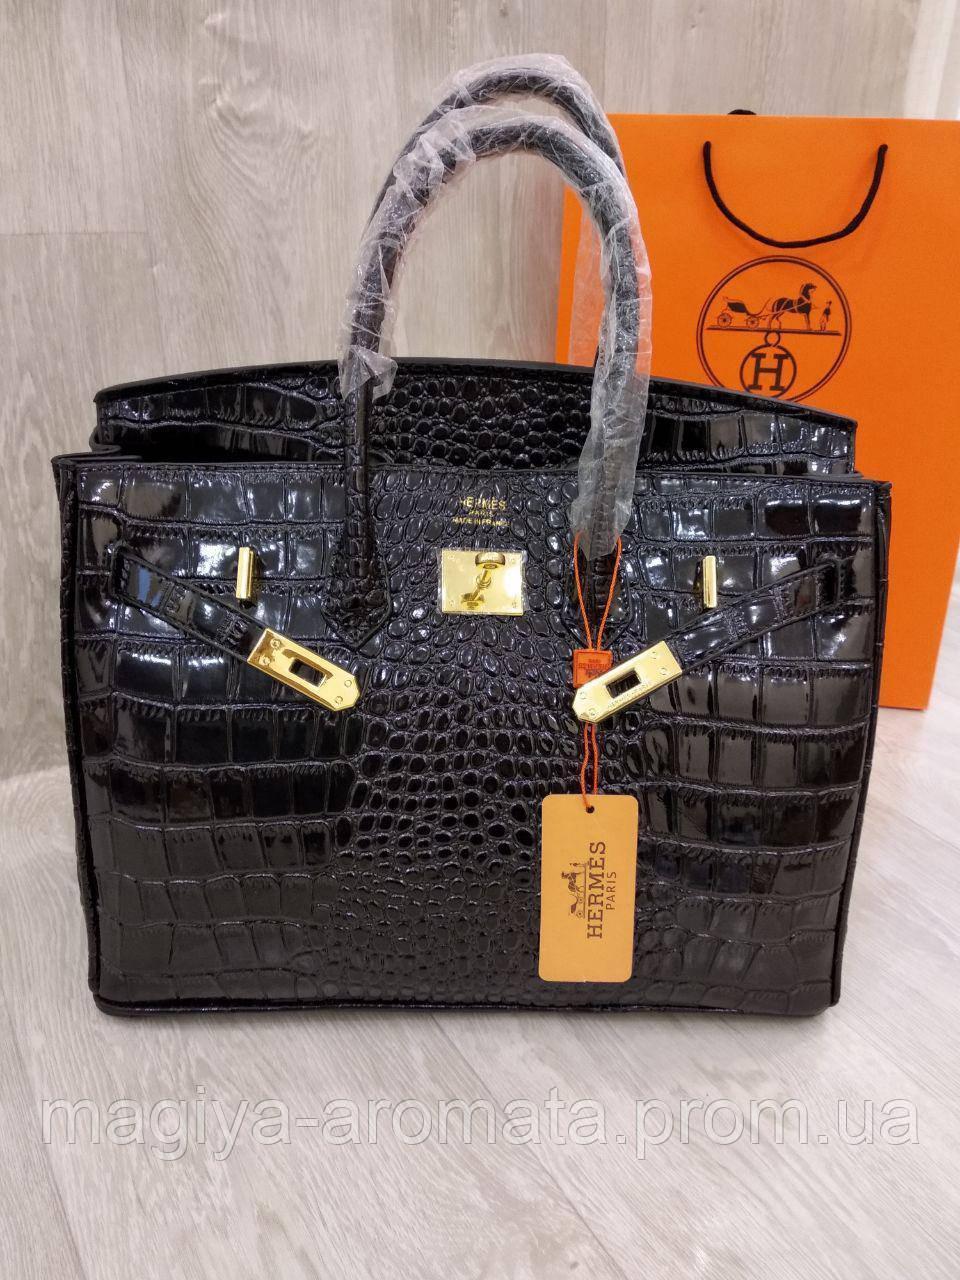 ab65ffbe89aa Женская сумка Hermes Birkin 35 см черная рептилия крокодил Original quality  Гермес Биркин Эрме